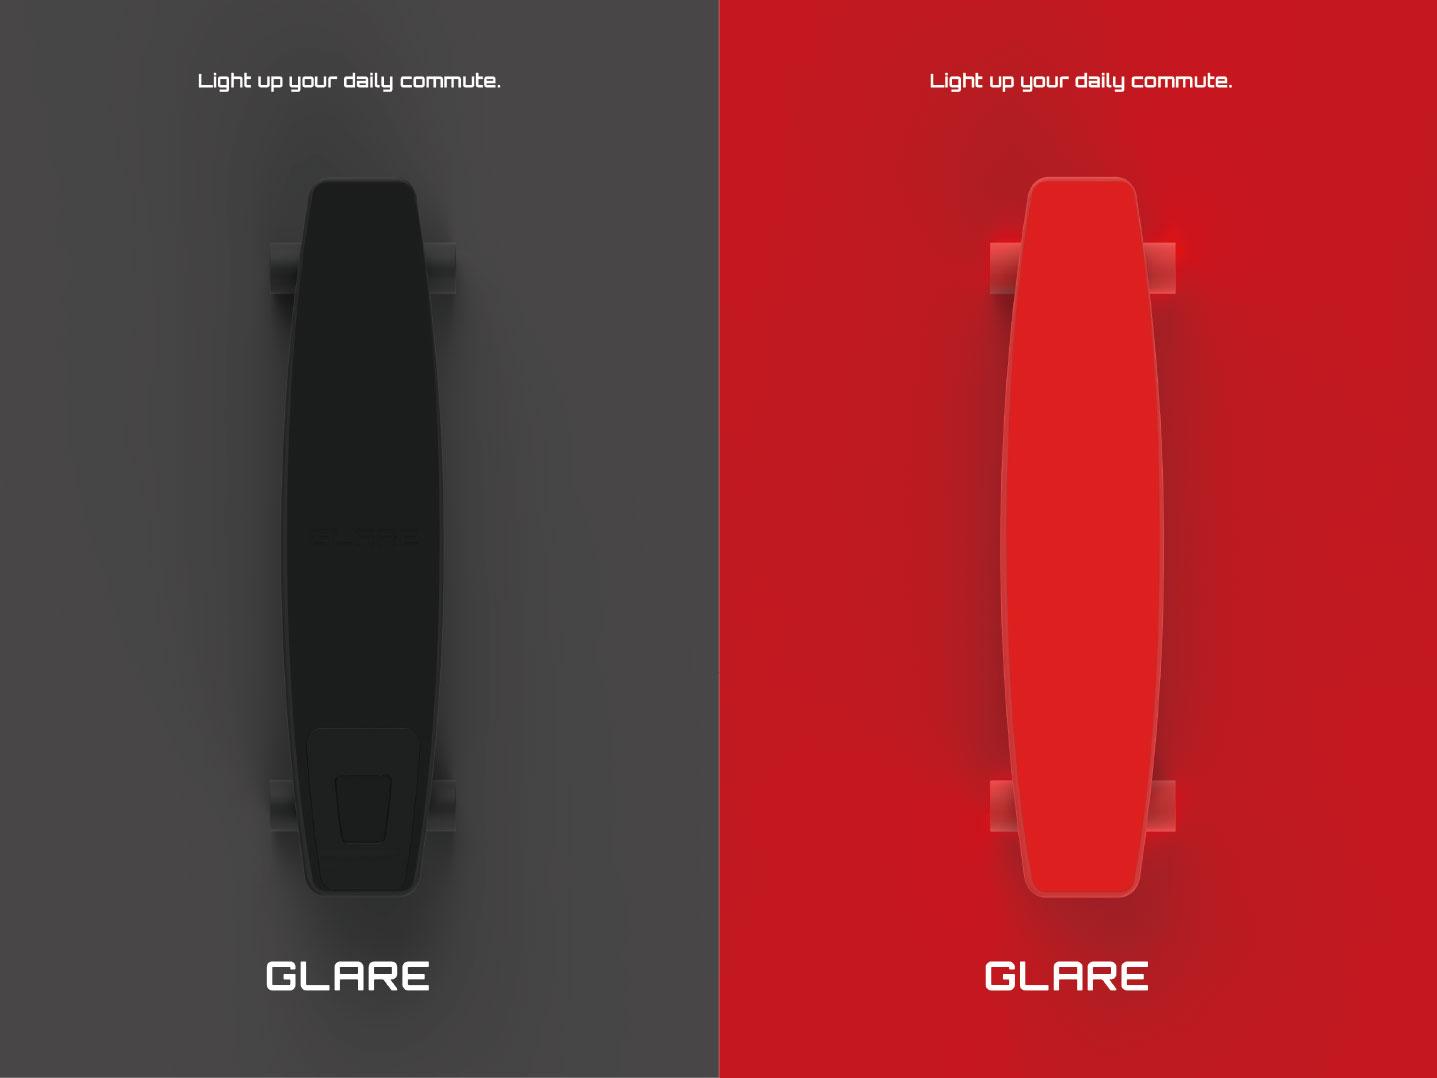 Glare-final-presentation-11-21-(dragged)-47.jpg